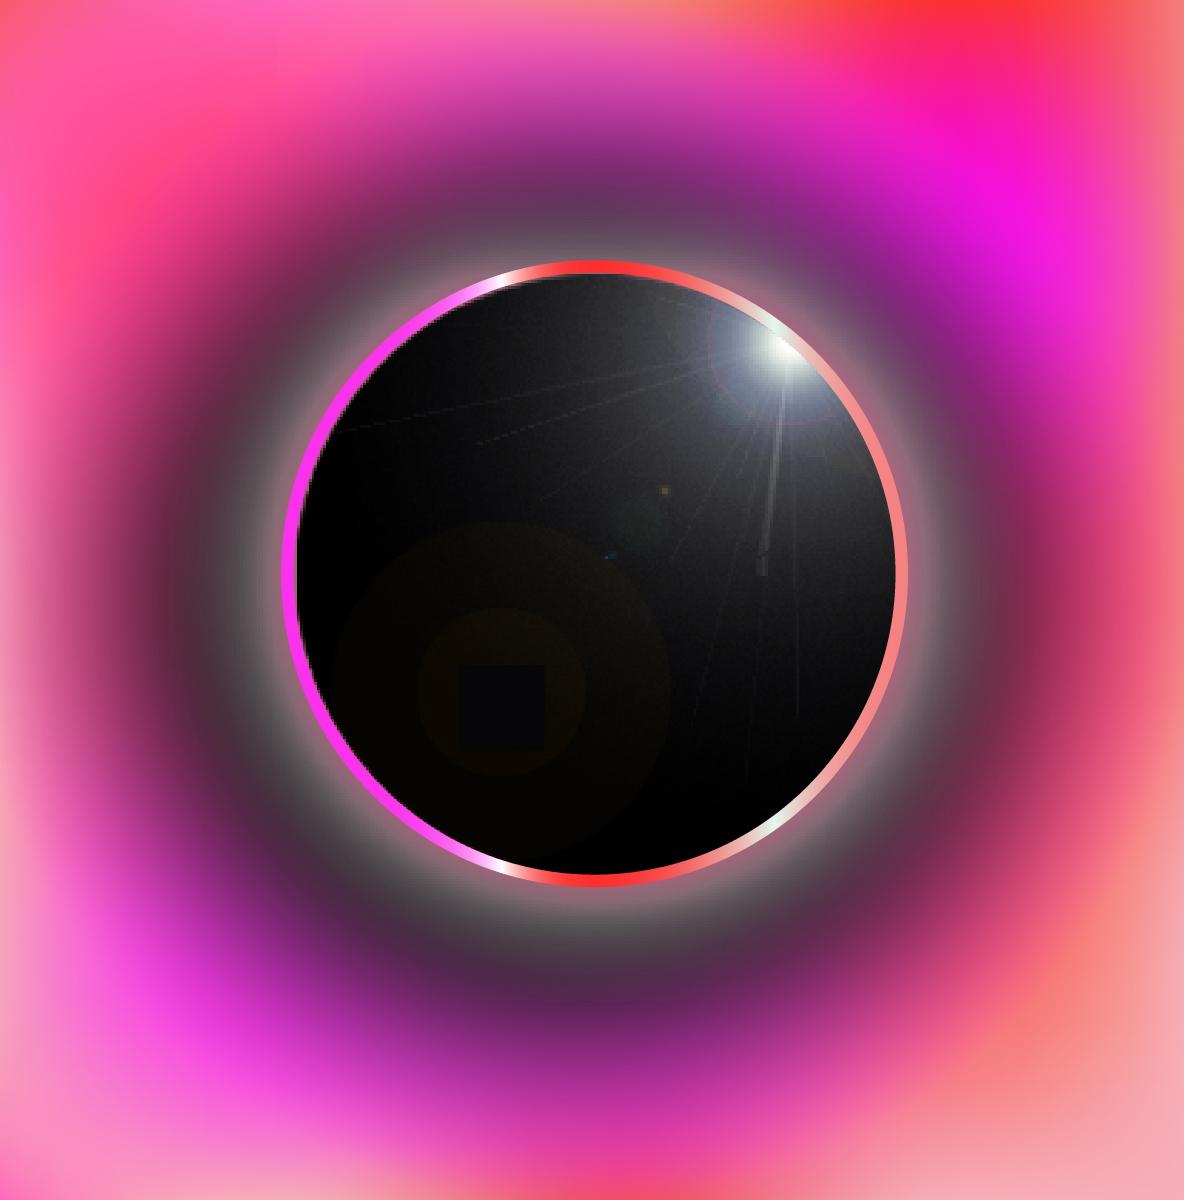 eclipse_2_b